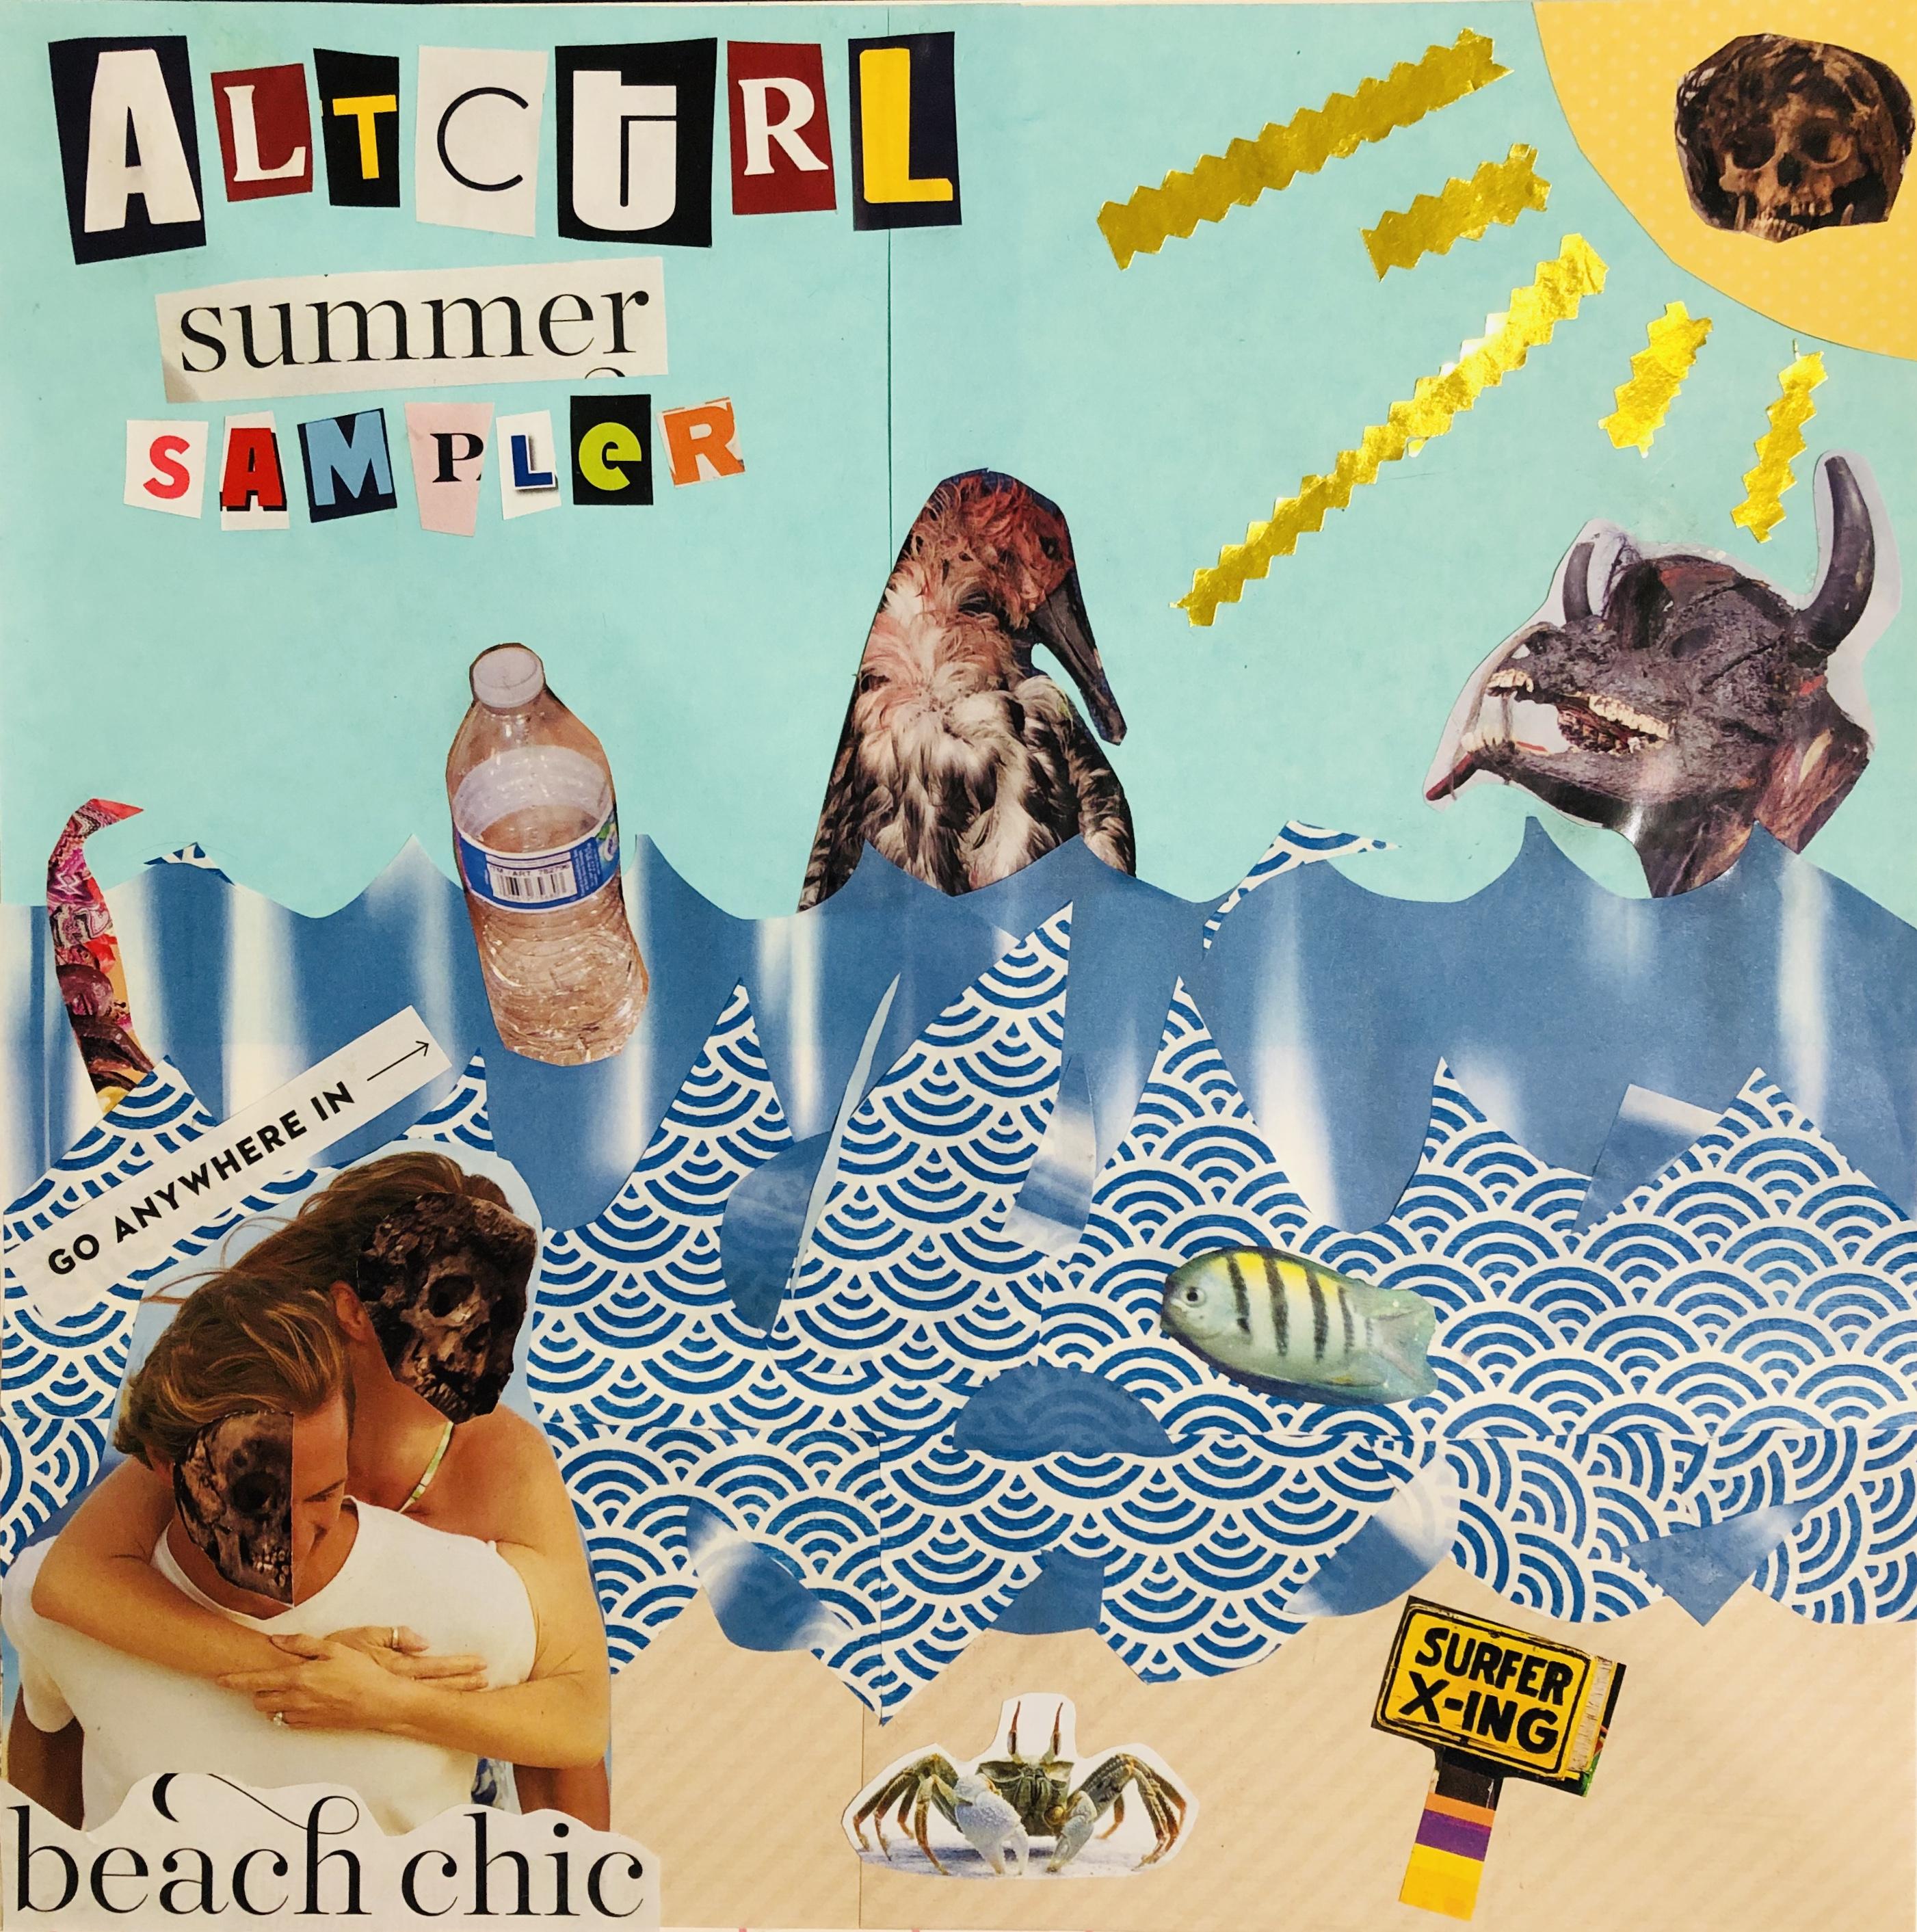 AltCtrl Summer Sampler